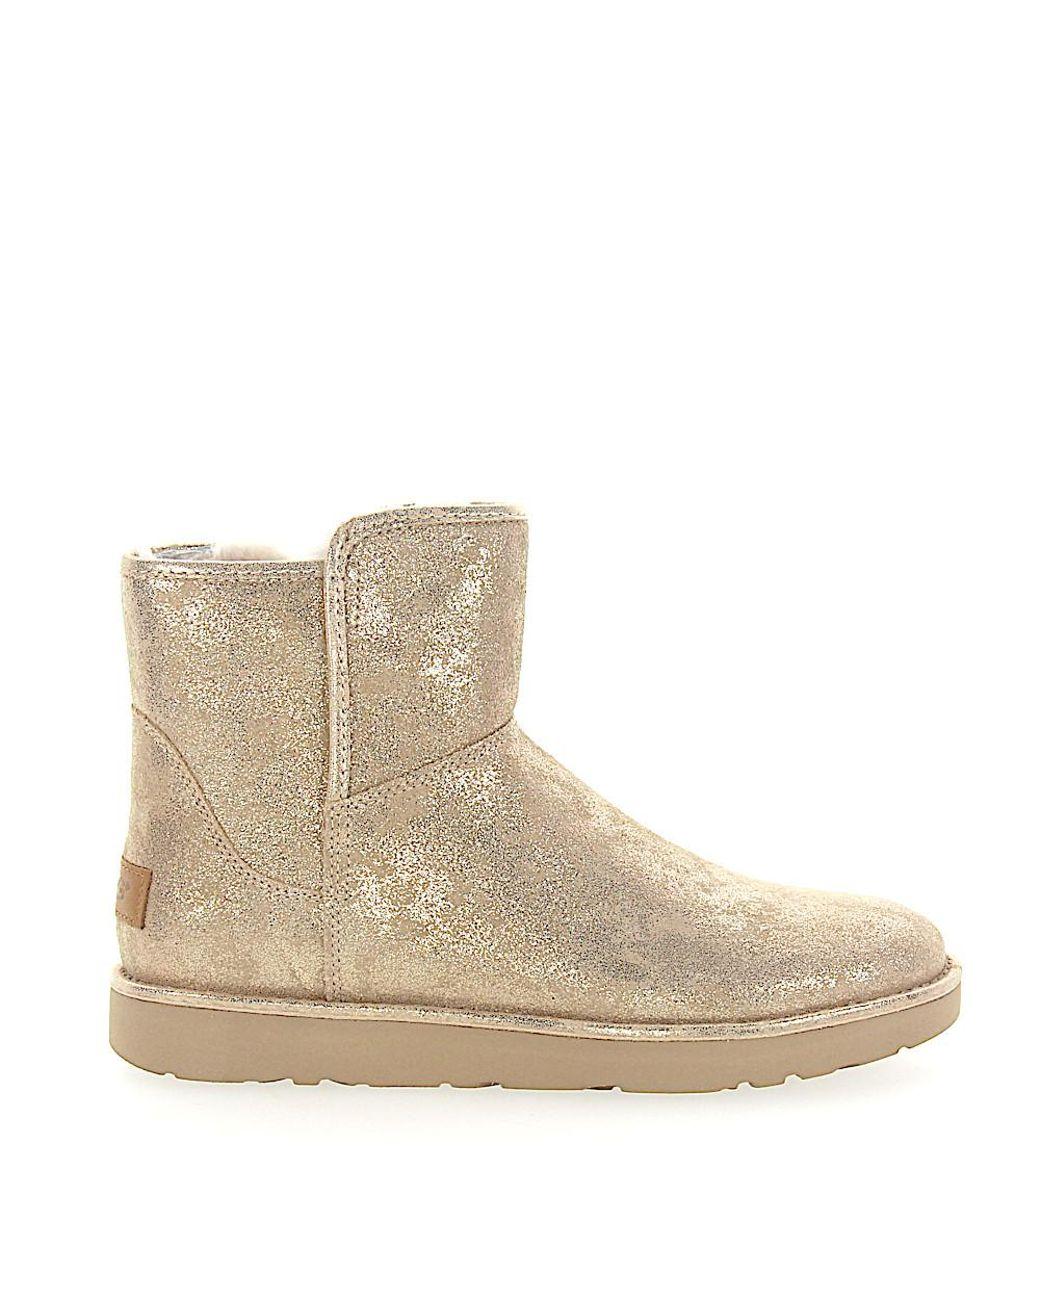 UGG Fur Stiefeletten Boots Abree Mini Veloursleder Gold